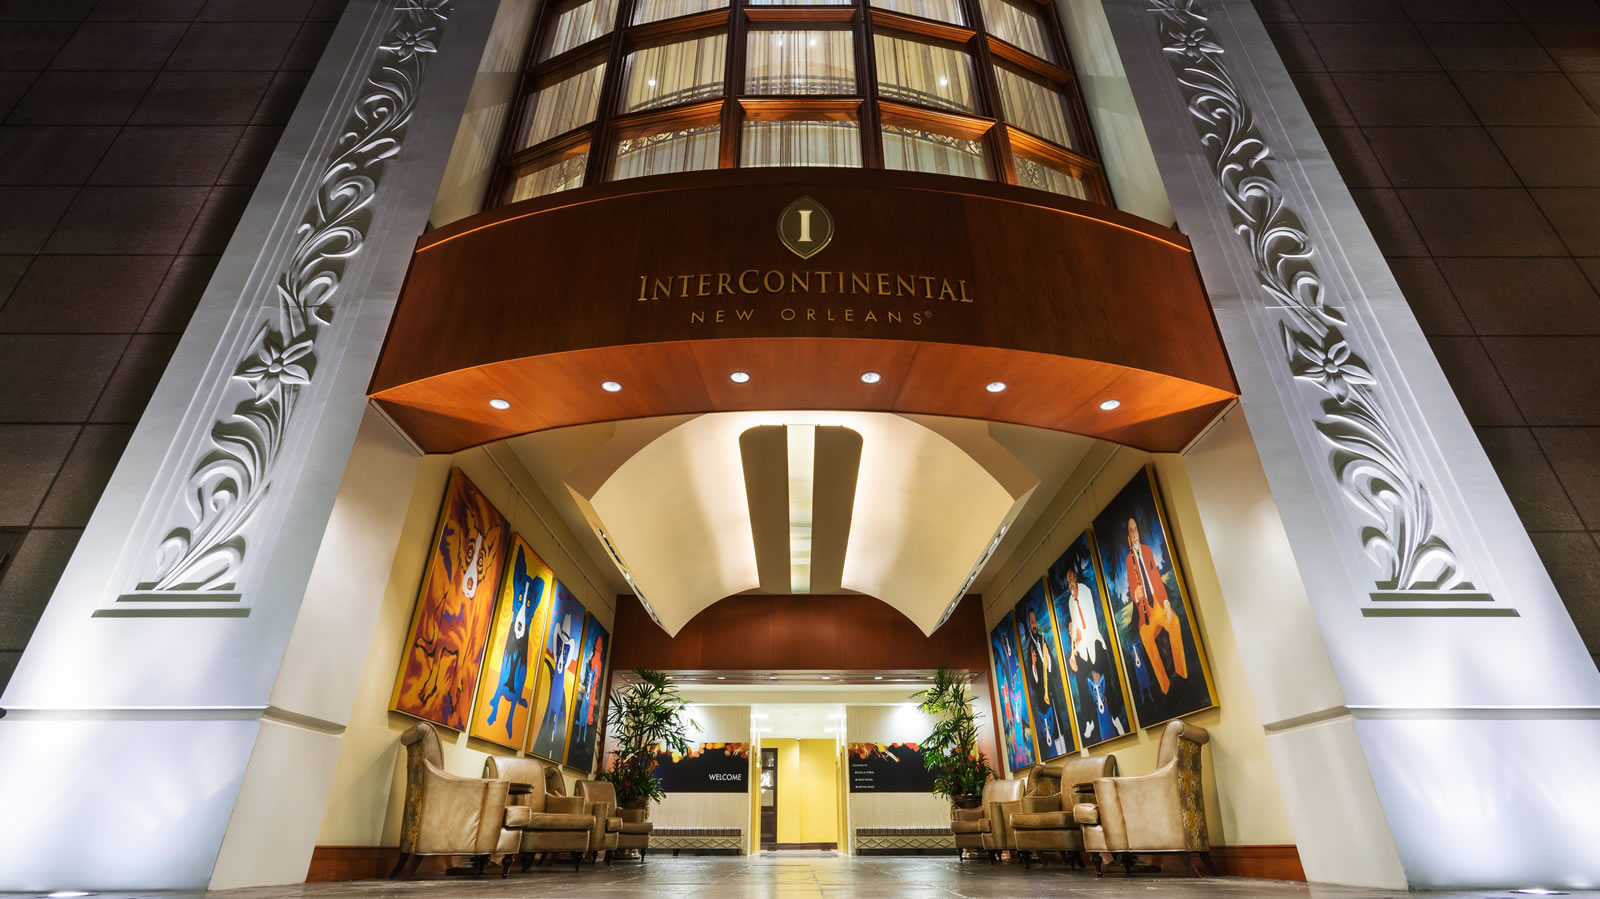 InterContinental New Orleans Hotel